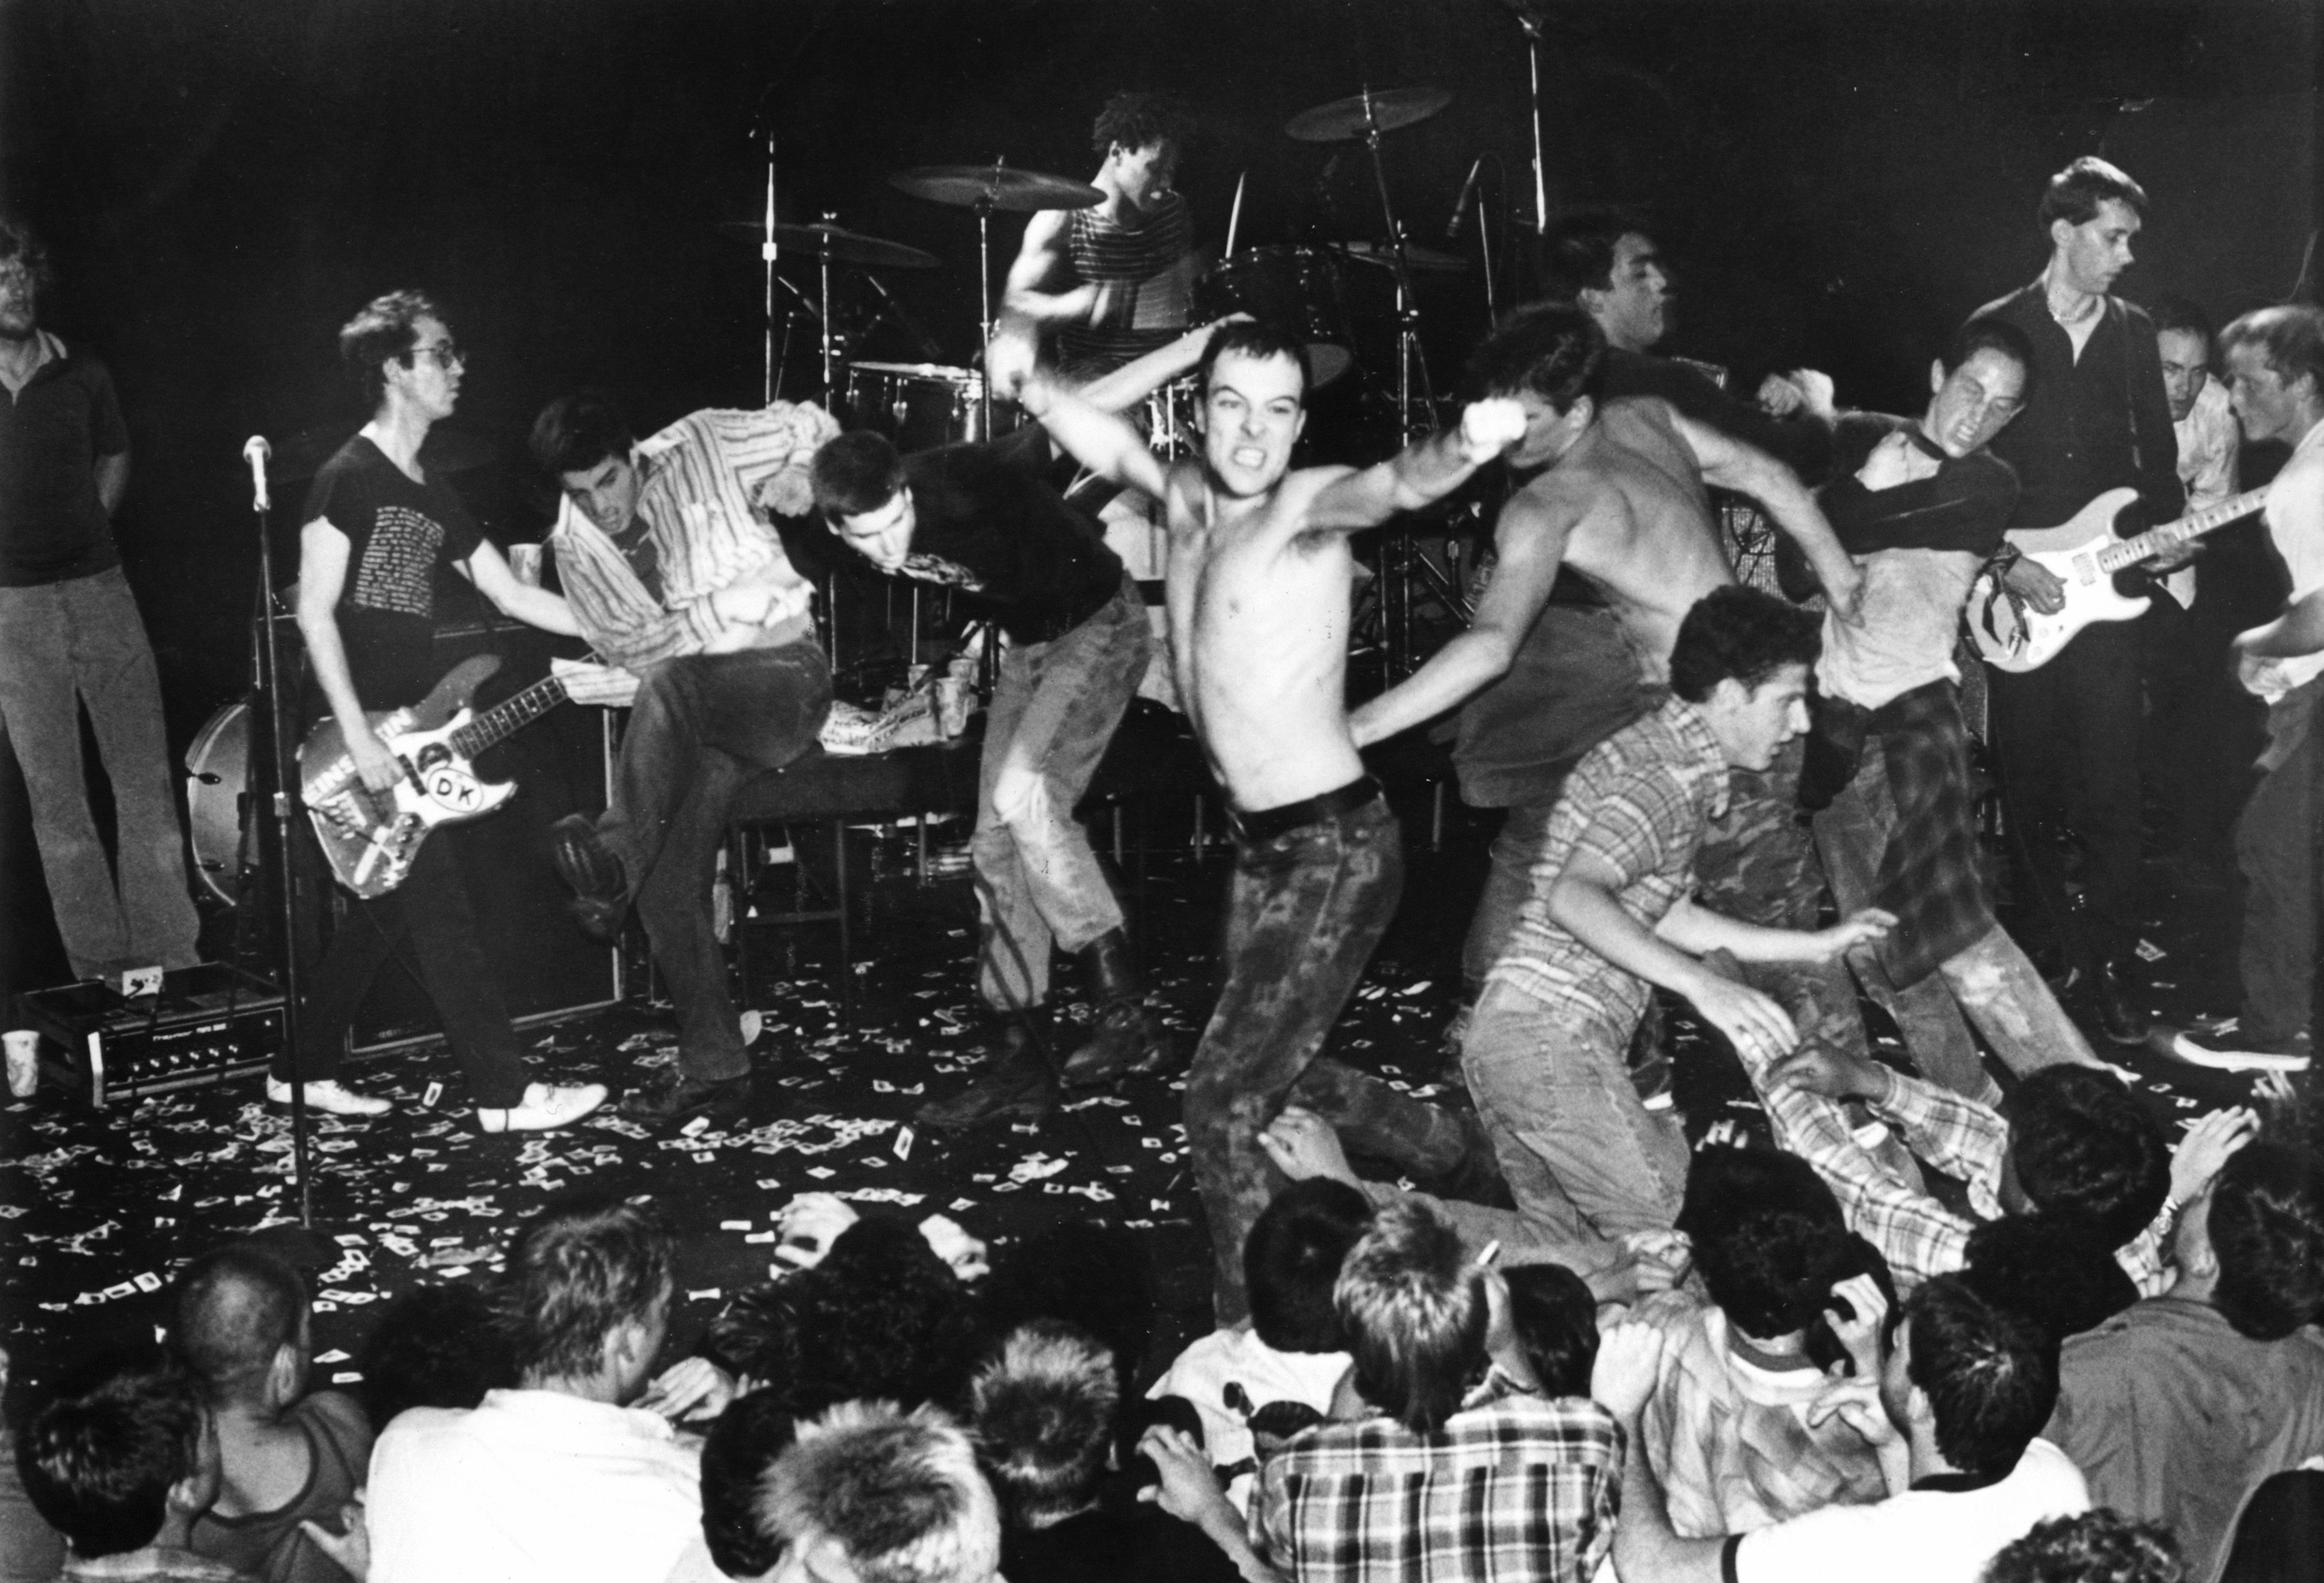 Dead Kennedys concert